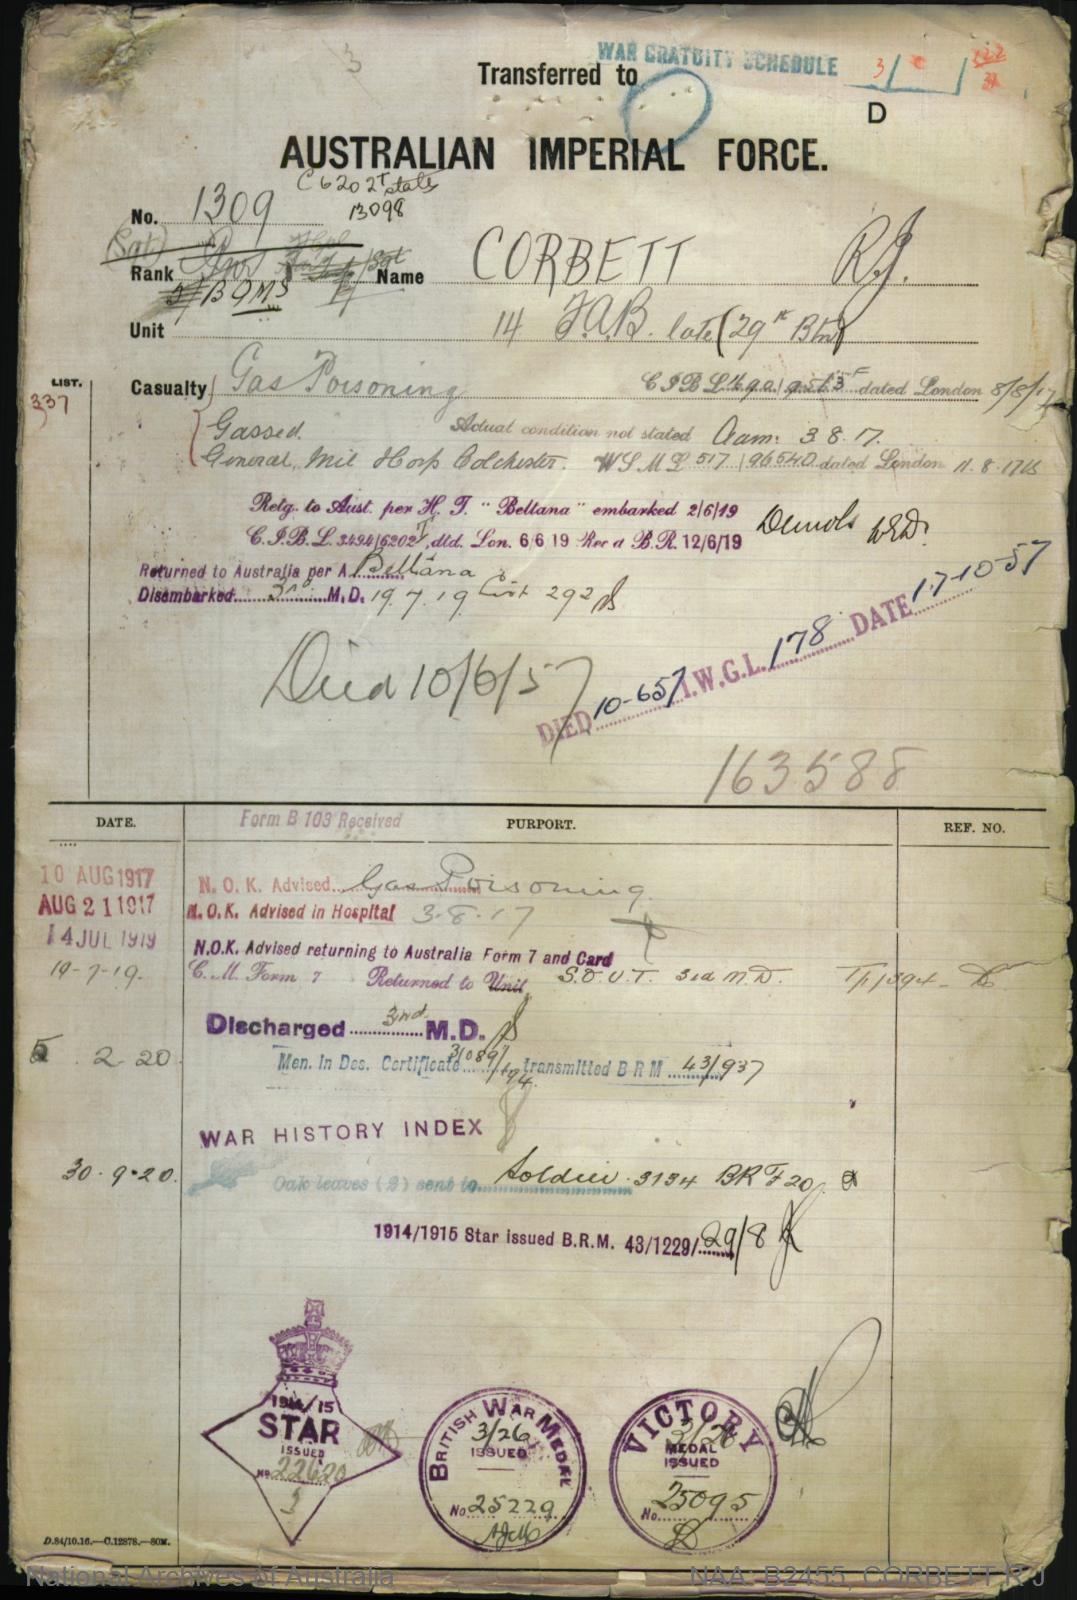 Corbett Robert James : SERN 1309 : POB Creswick VIC : POE Ballarat VIC : NOK F Corbett R J